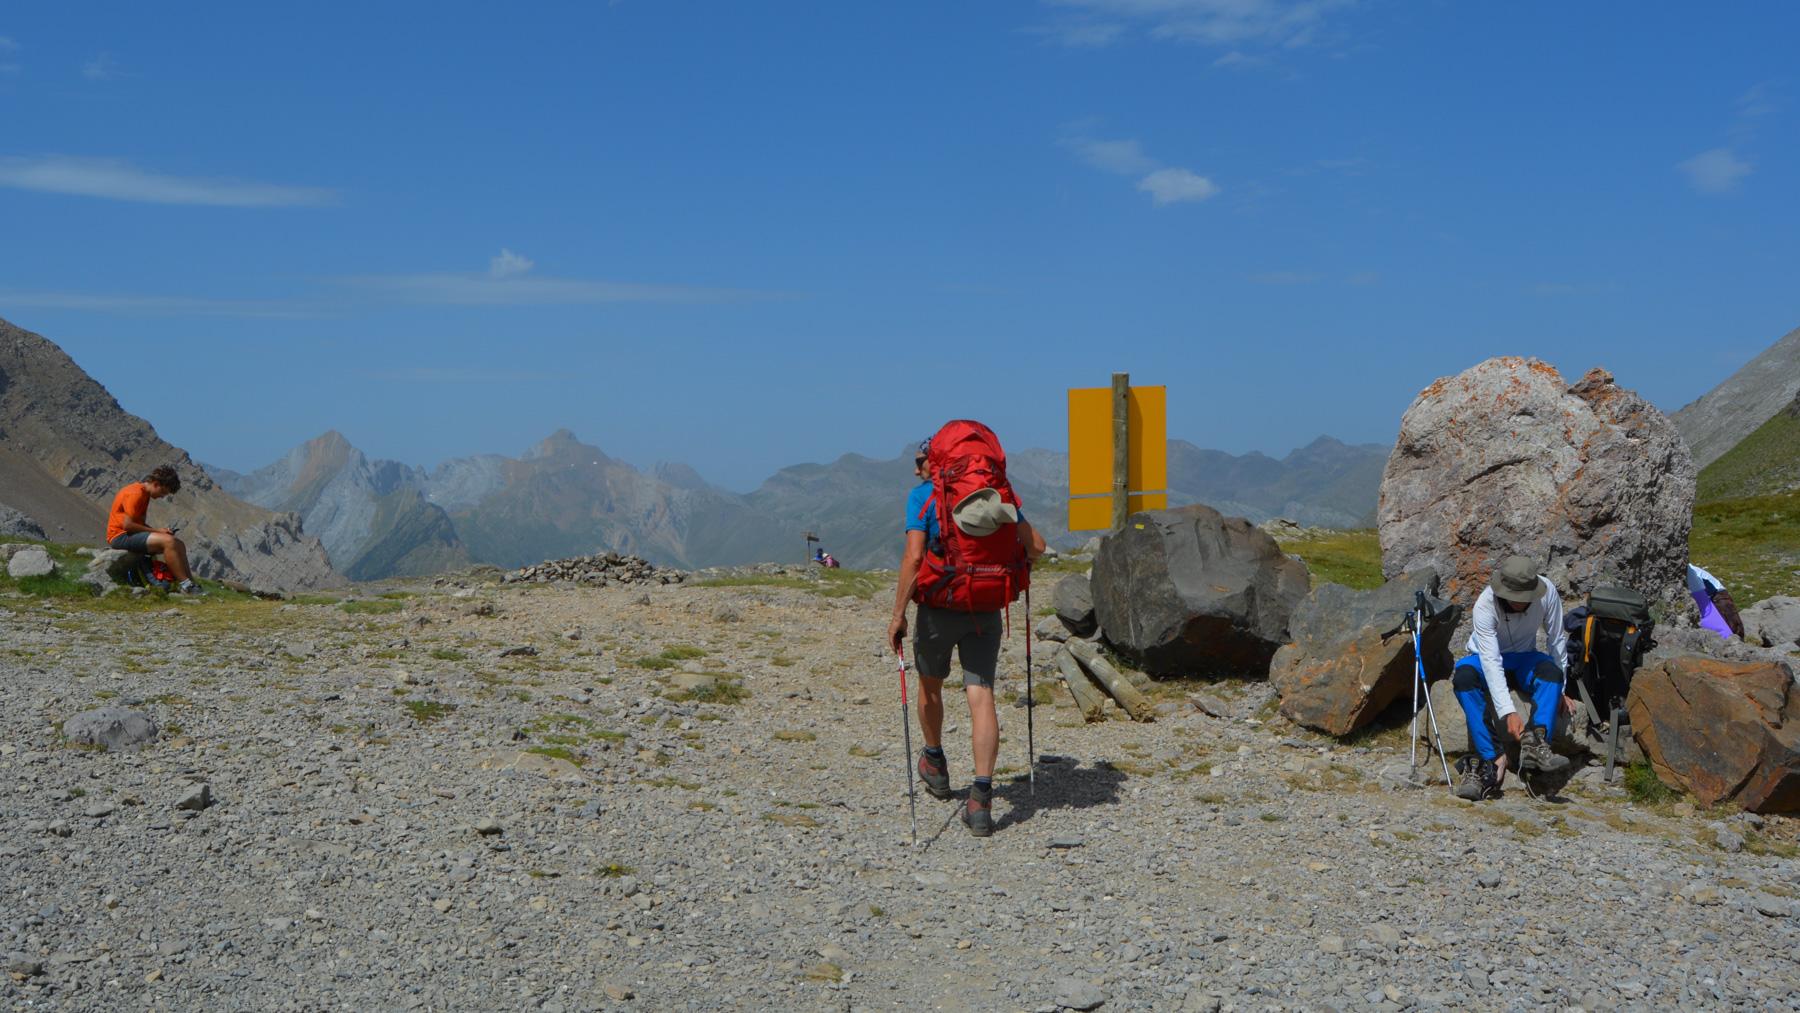 Monte Perdido et Faja de las Flores, Jour 1, Ordesa, Aragon, Espagne 4